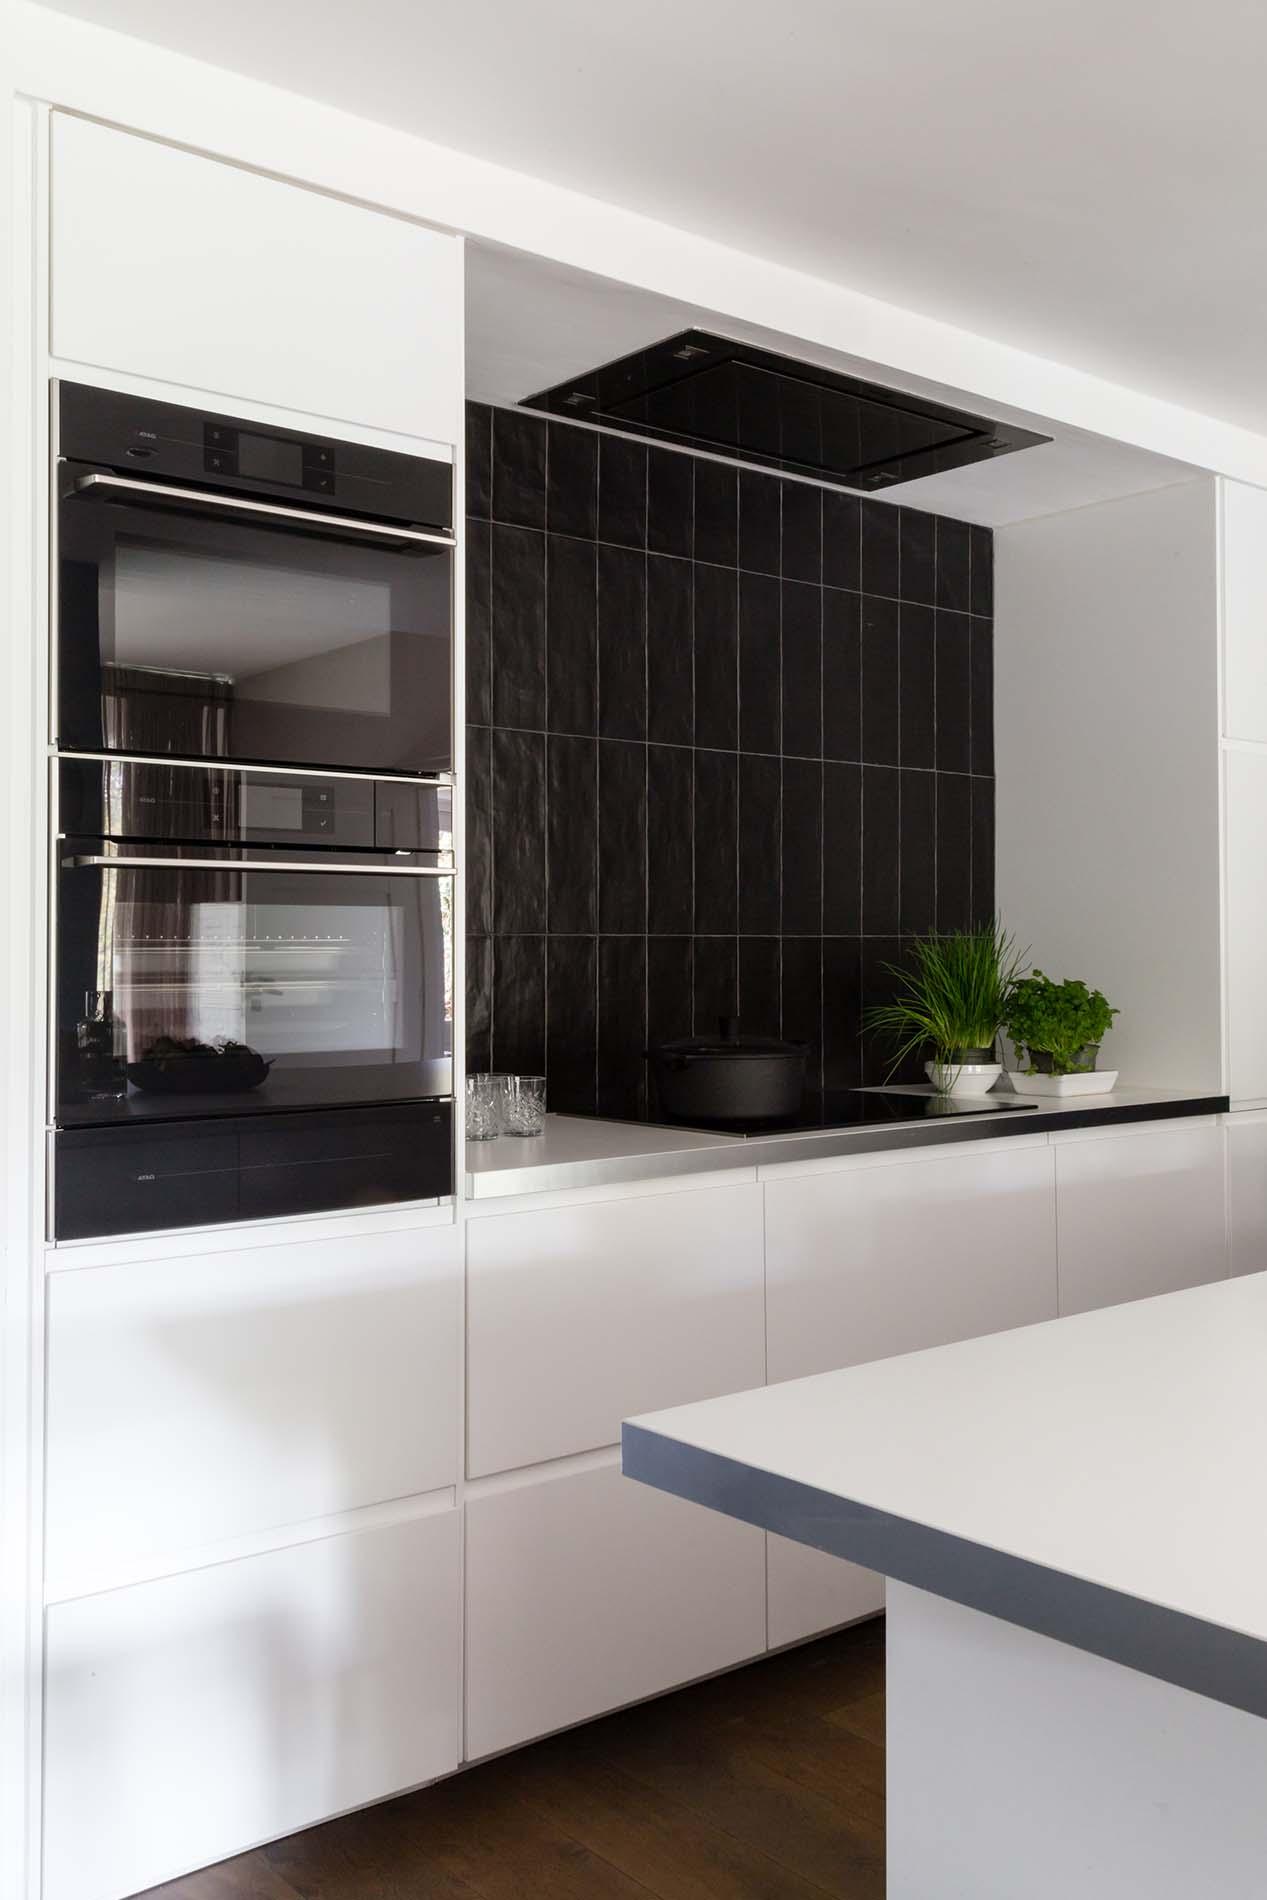 vtwonen keuken met zwarte ATAG apparatuur, ASWA Keukens